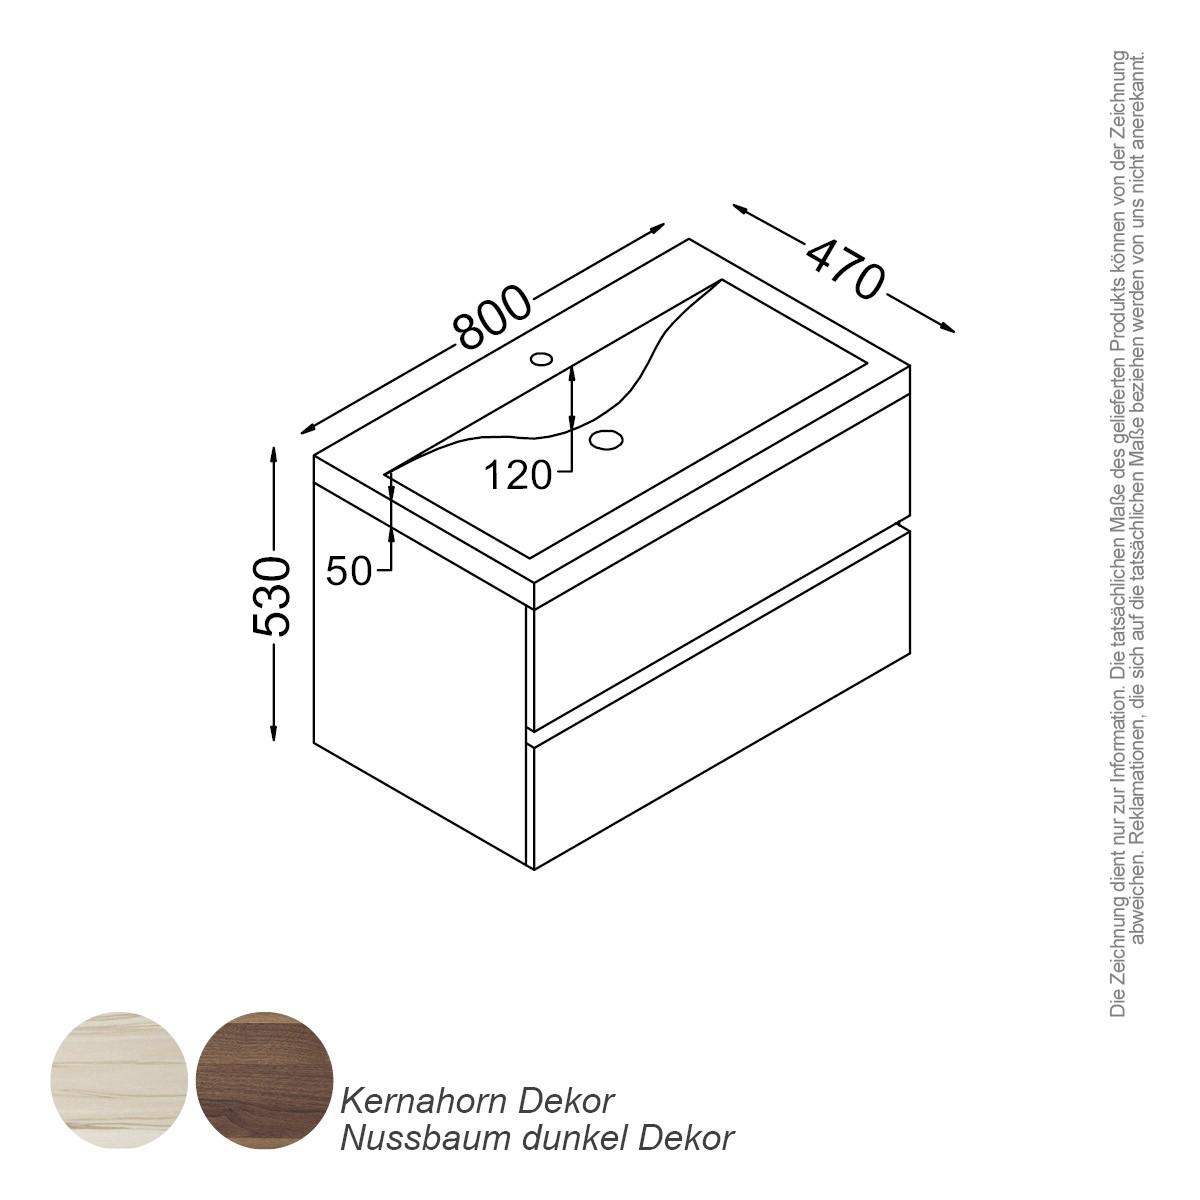 paris waschtisch-set 80 cm kernahorn badewelt badezimmer möbel, Badezimmer ideen